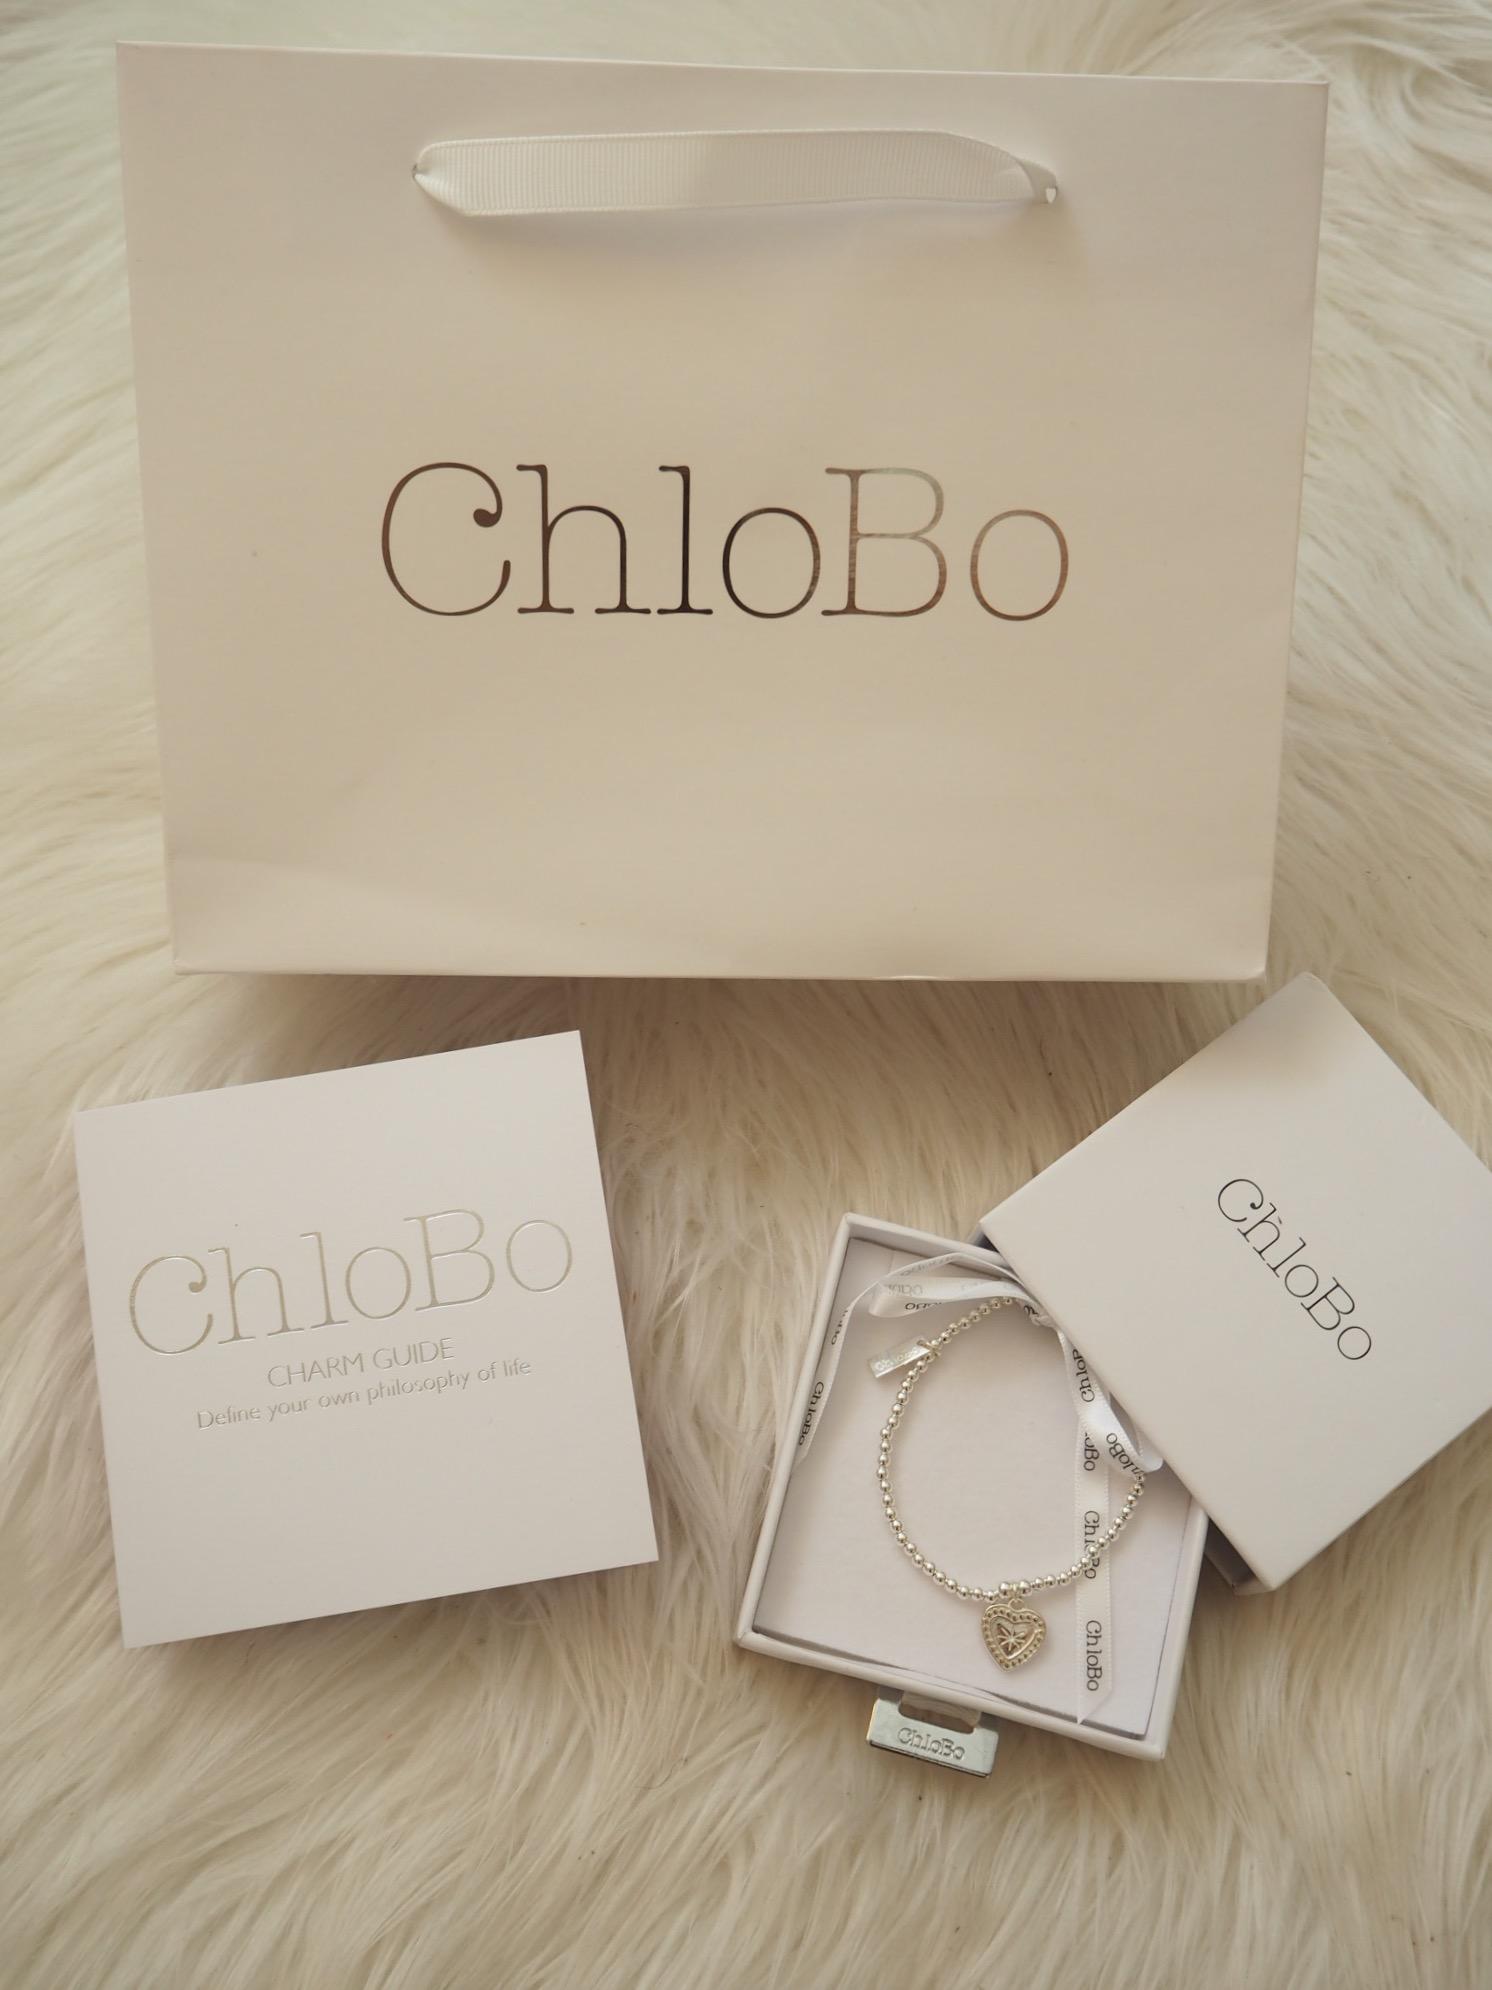 ChloBo gift